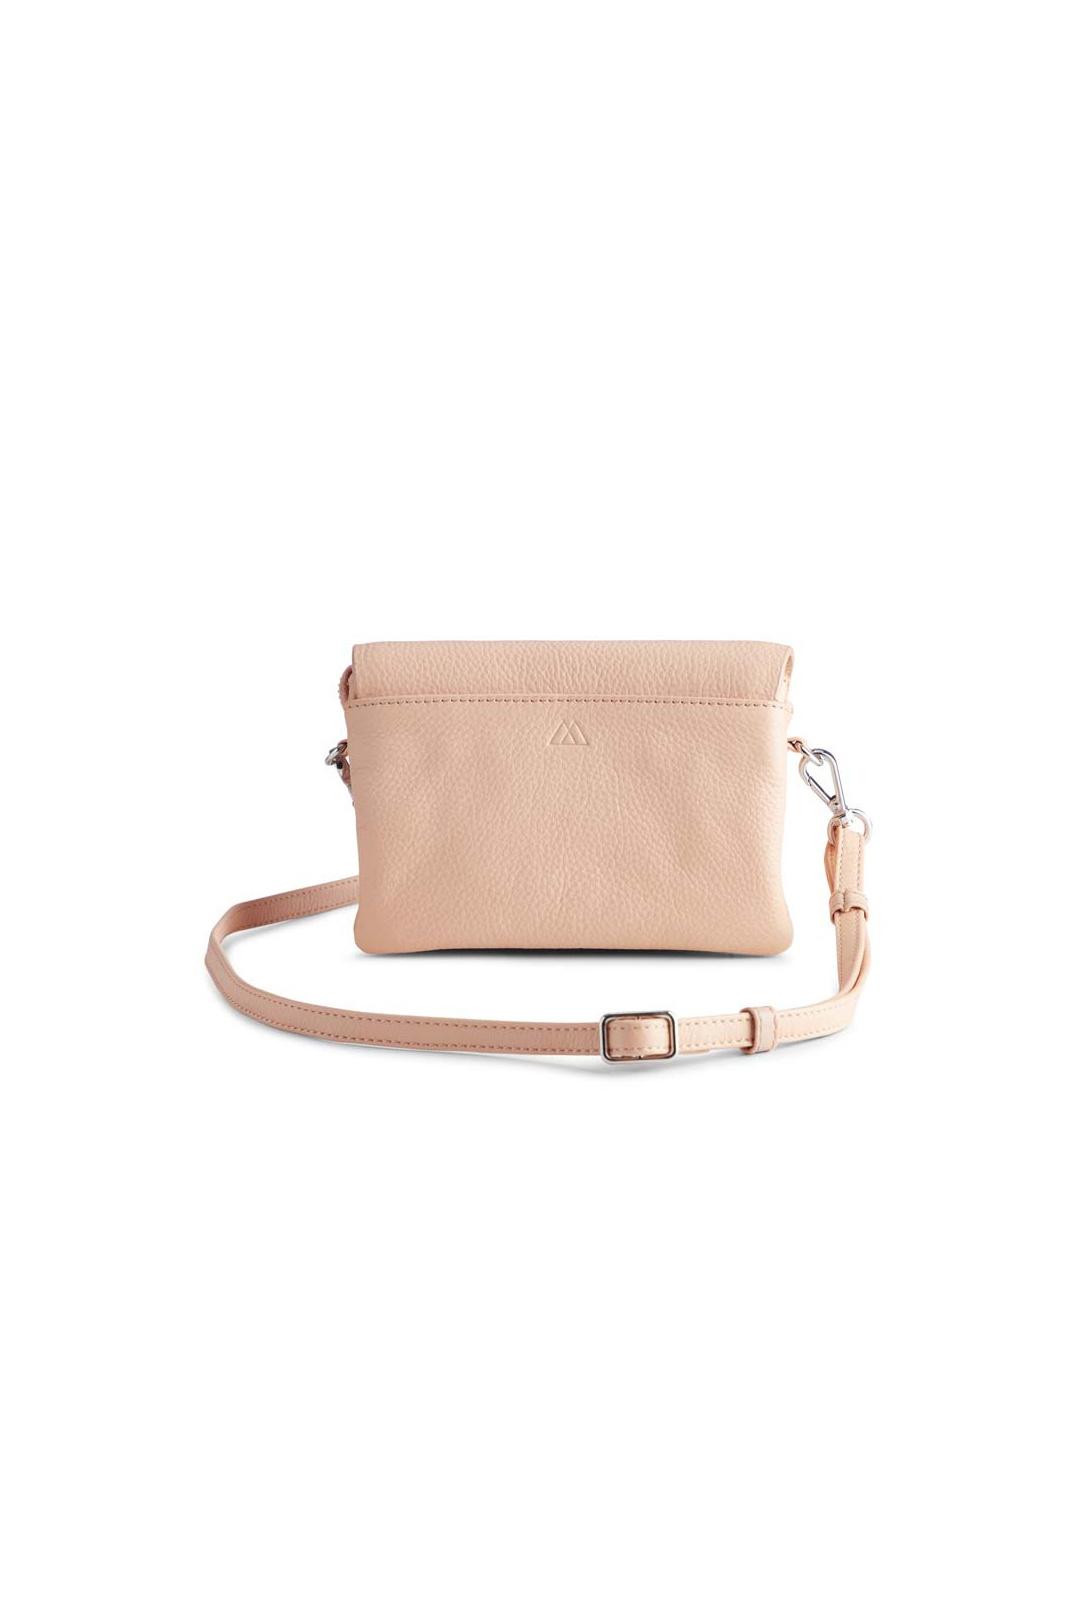 Adella Crossbody Bag Grain - Peach-4